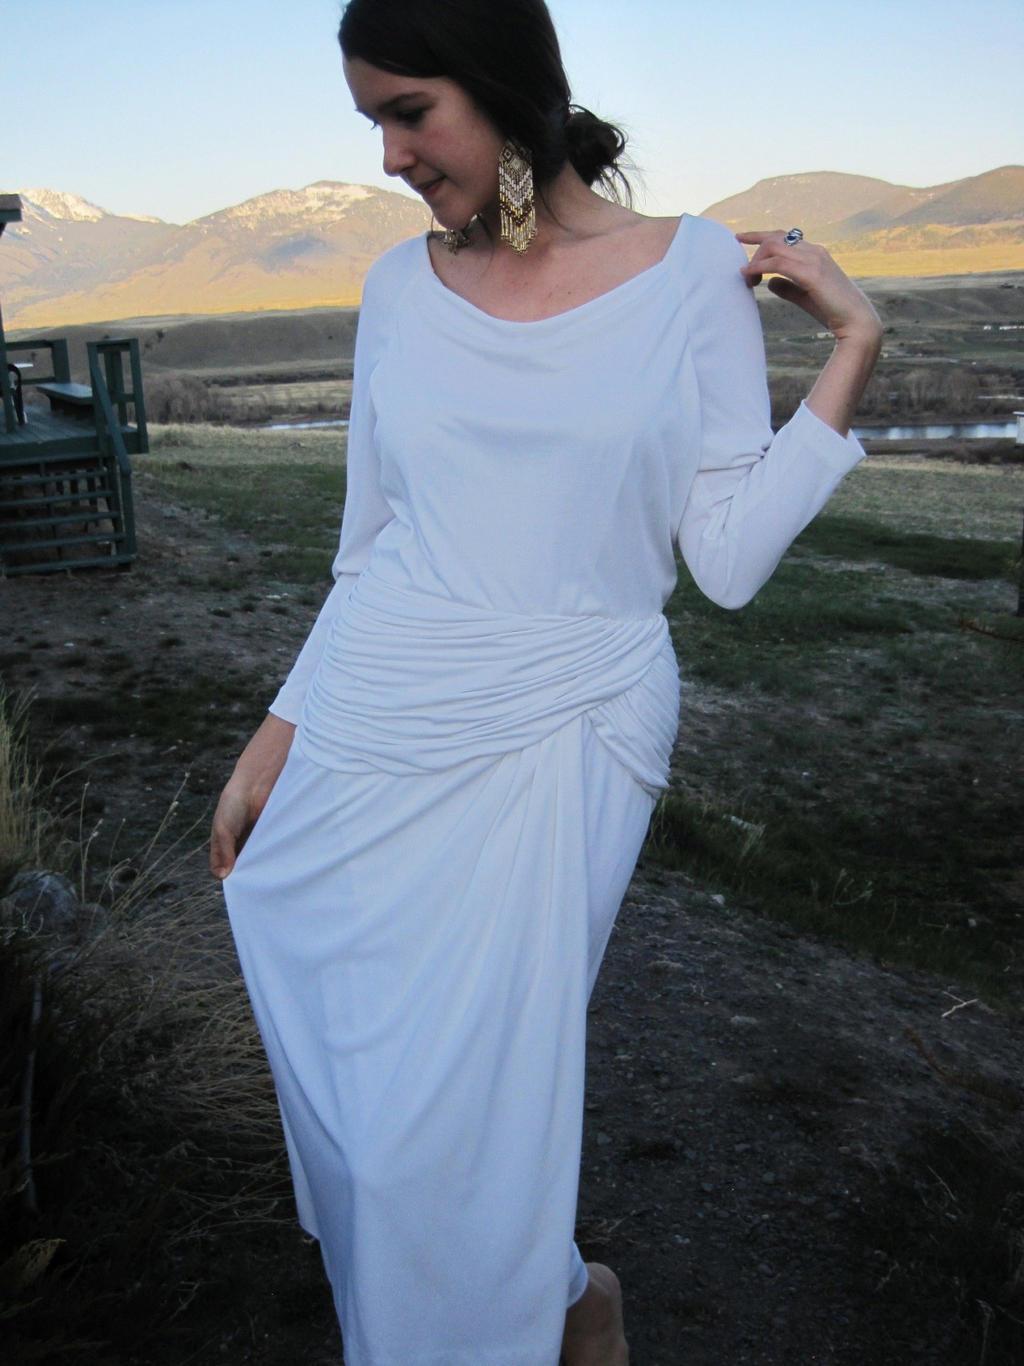 Wedding dress full body 2 by gypsyja stock on deviantart for Full body wedding dress